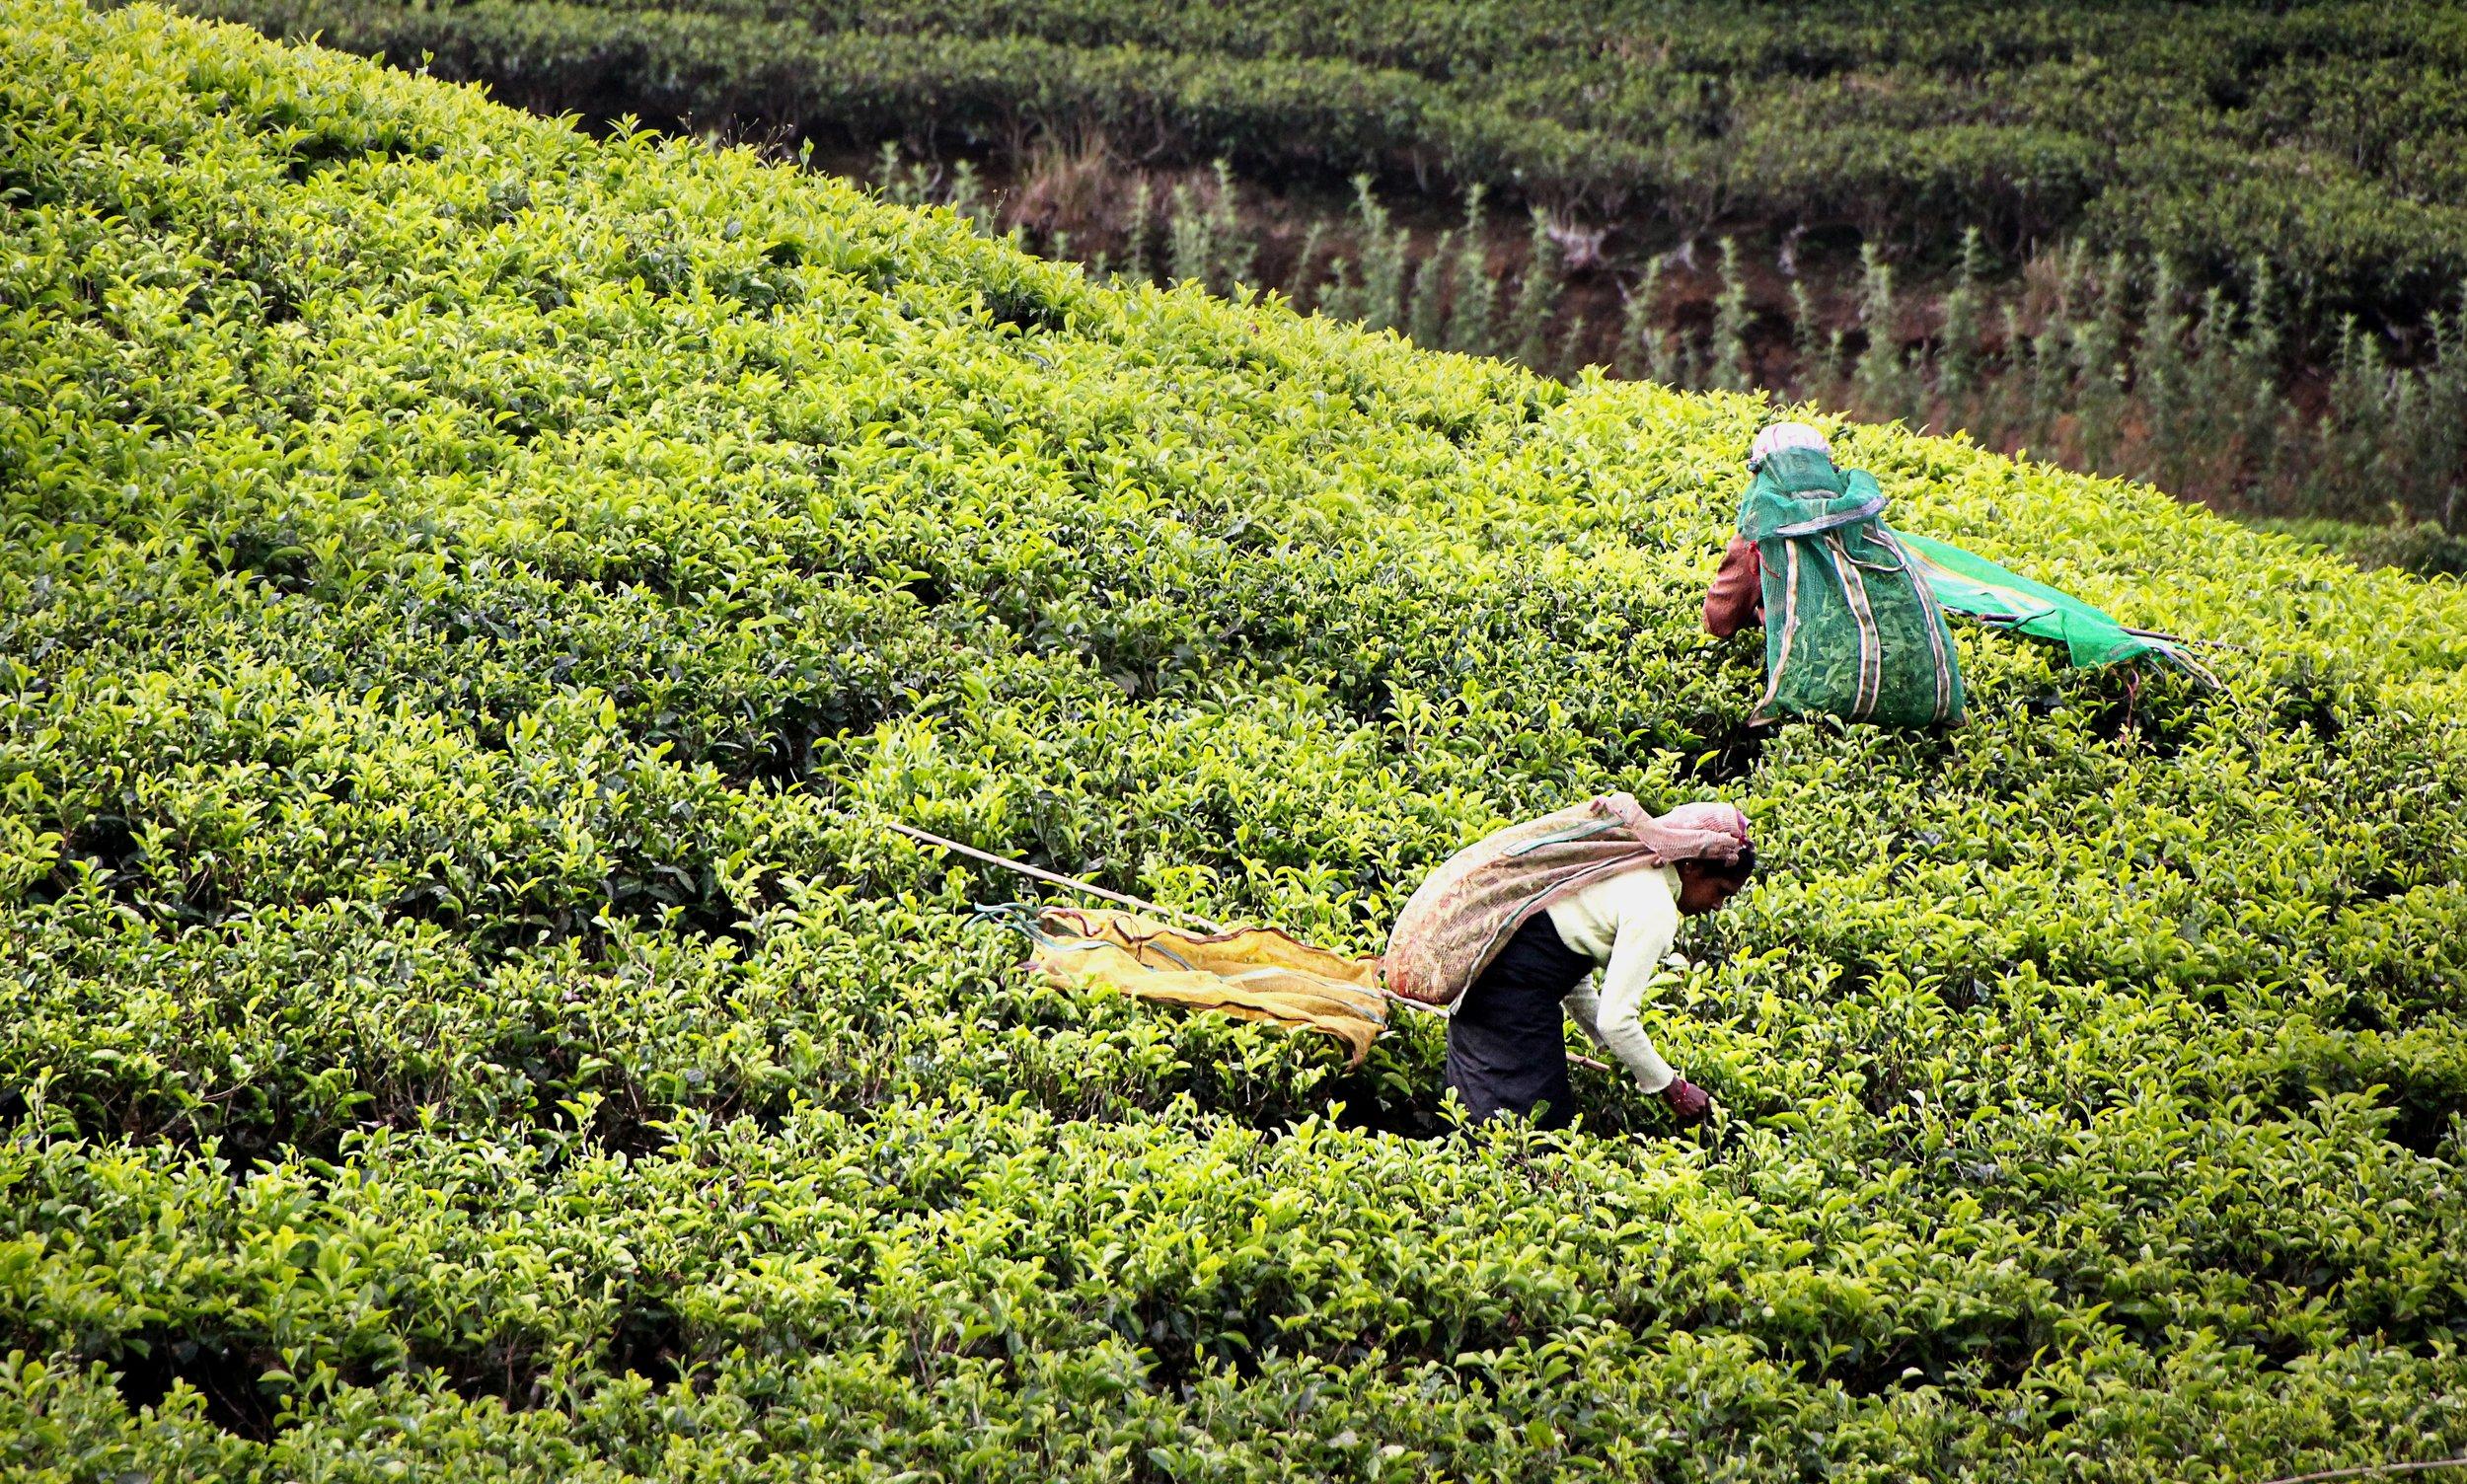 Tea pickers at work in Kandy, Sri Lanka